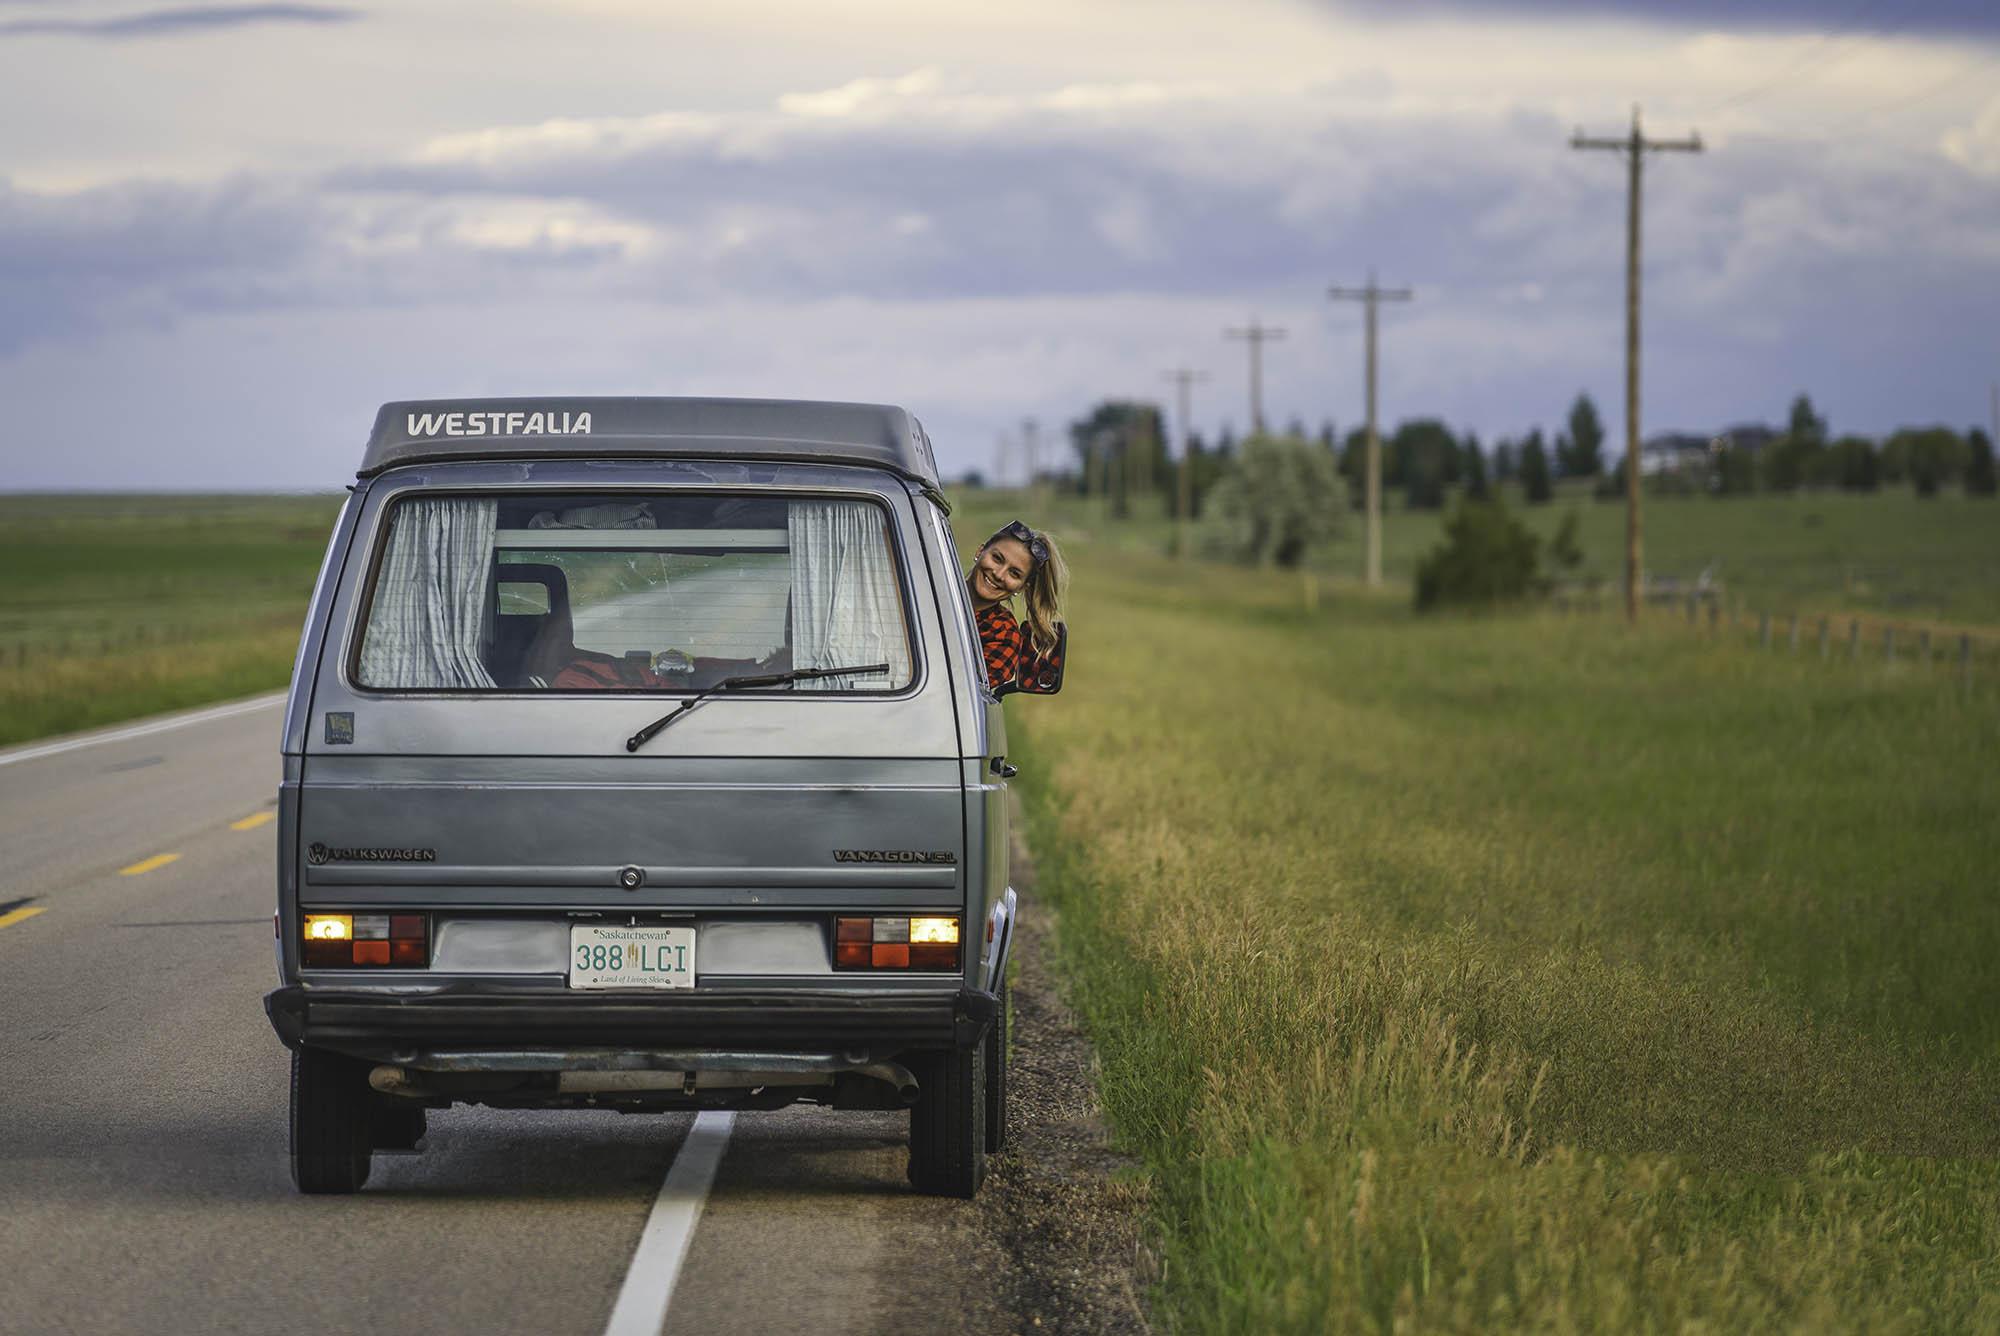 Preparing for a Roadtrip